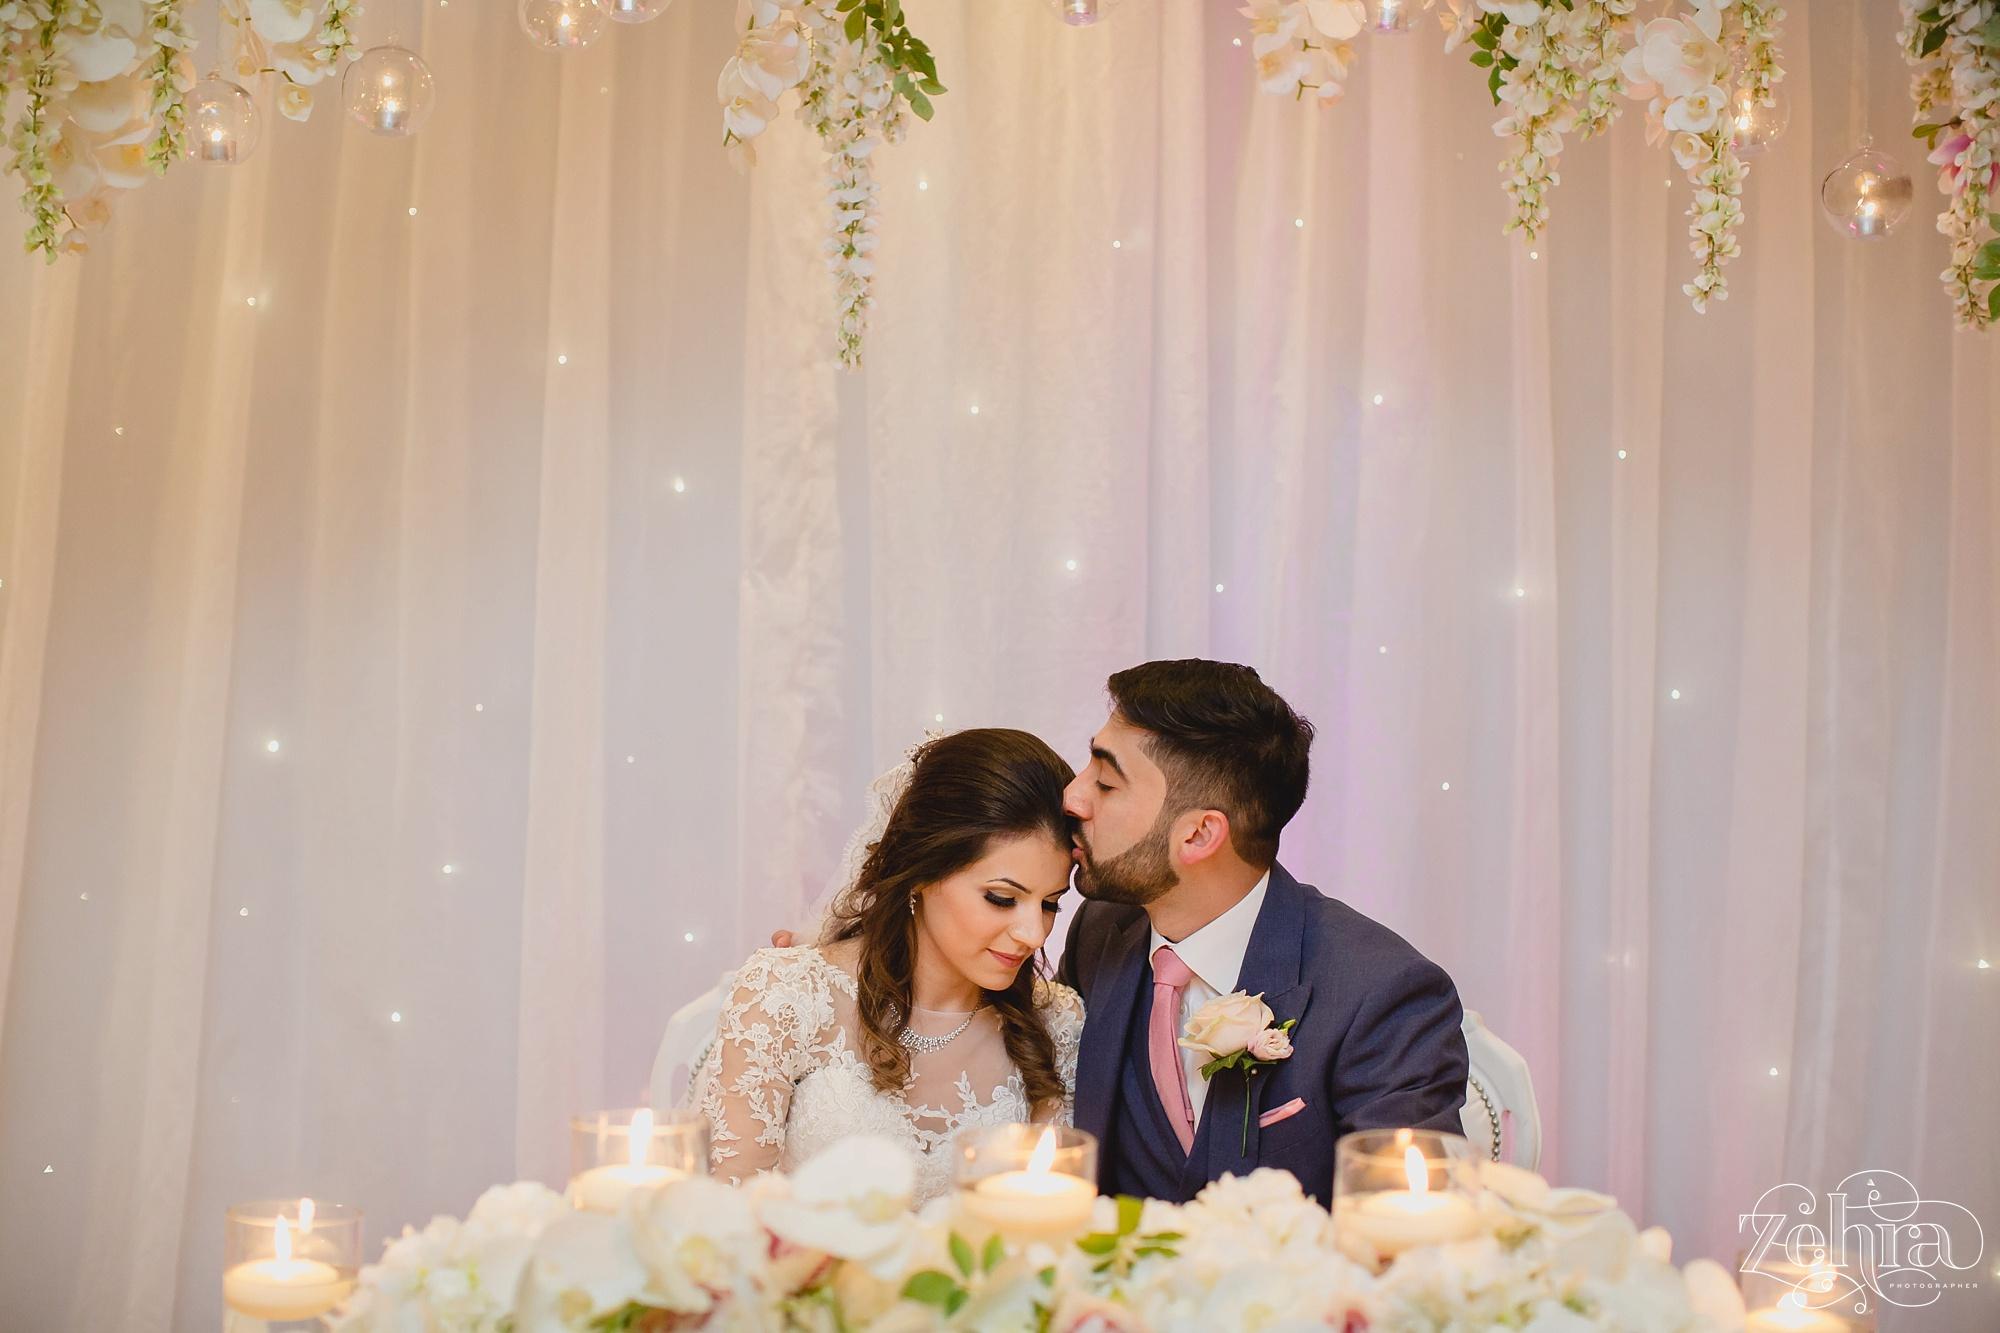 zehra photographer mere cheshire wedding_0016.jpg